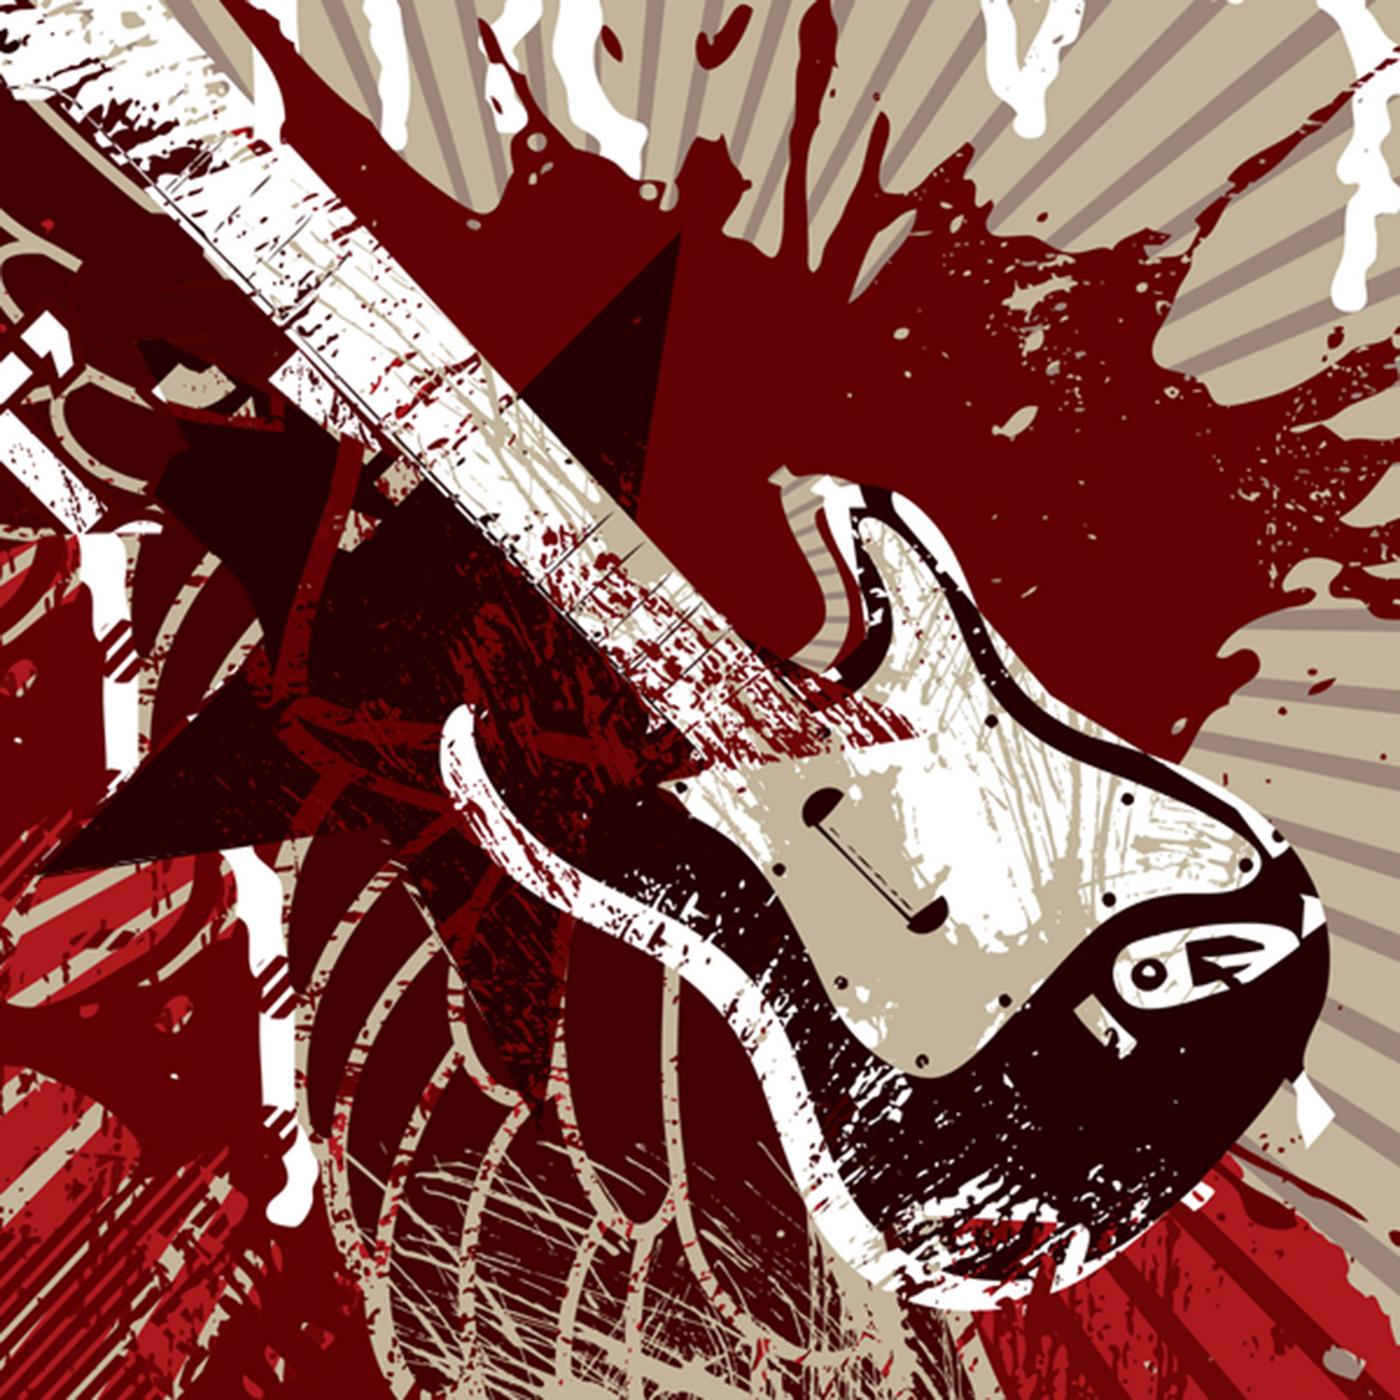 Pictures Of Alternative Rock Singers: Modern Rock On ROCKRADIO.COM - ROCKRADIO.COM